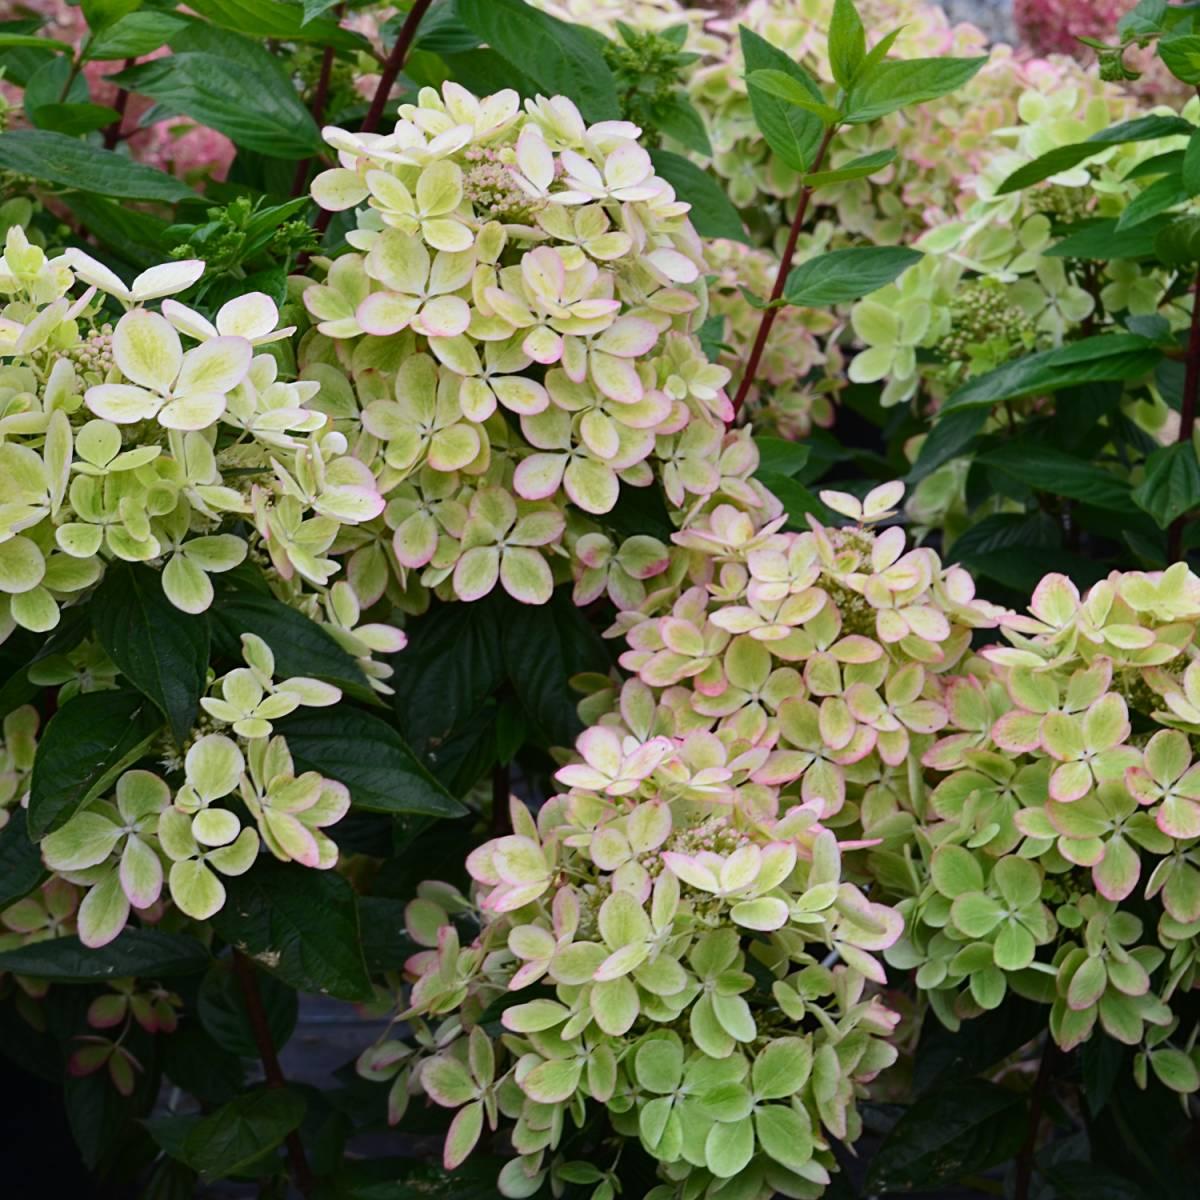 hortensia-paniculata-pastelgreen-rencolo